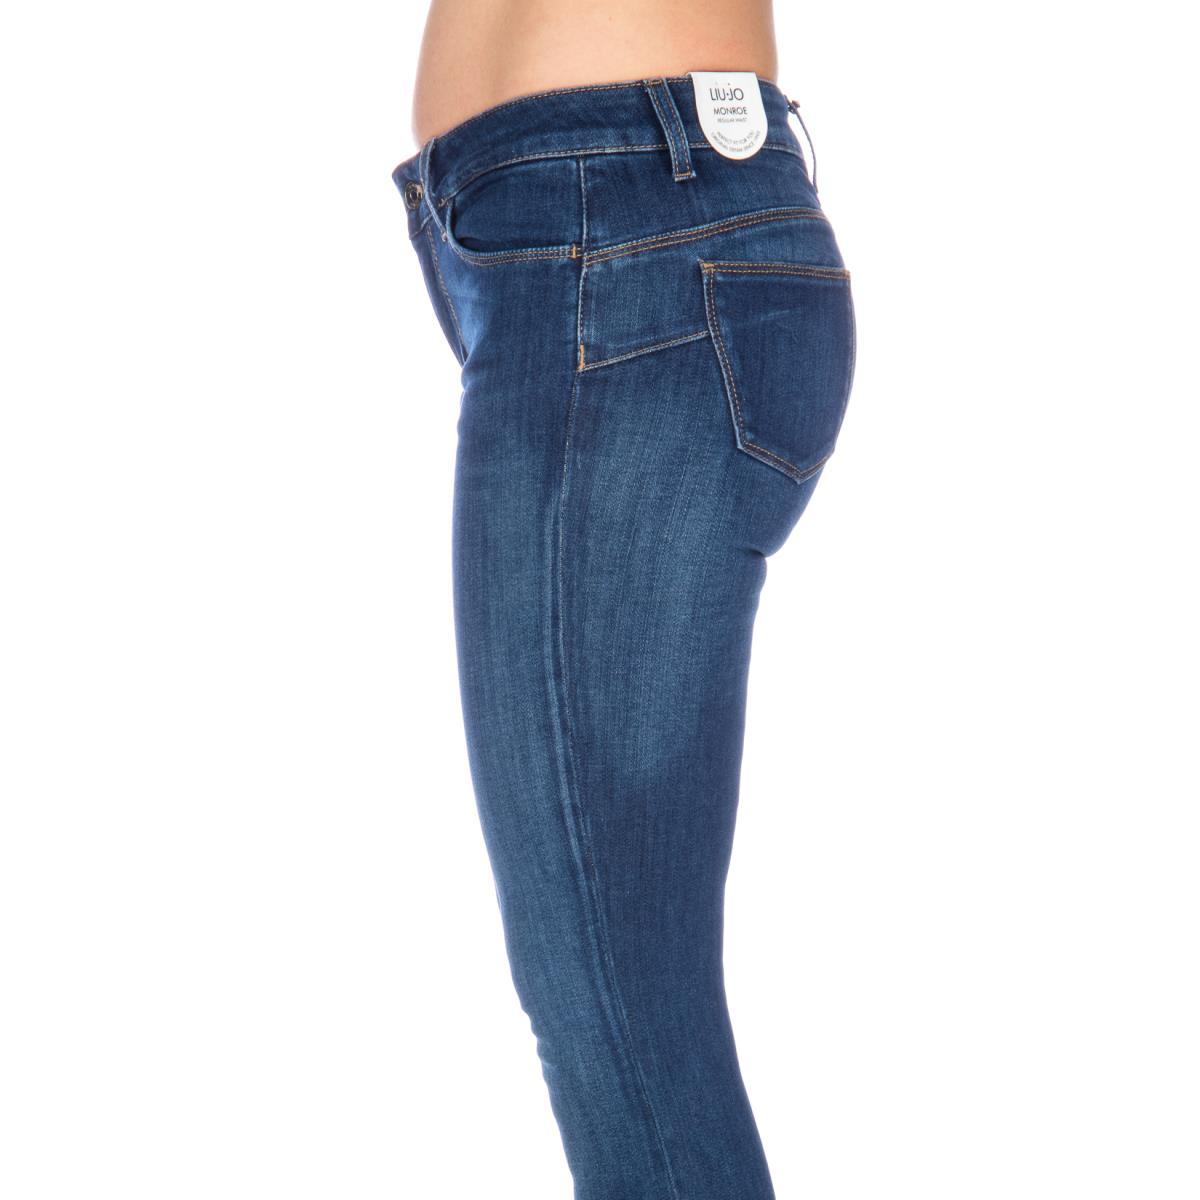 liu jo jeans u17005d4043 giannini shop online. Black Bedroom Furniture Sets. Home Design Ideas